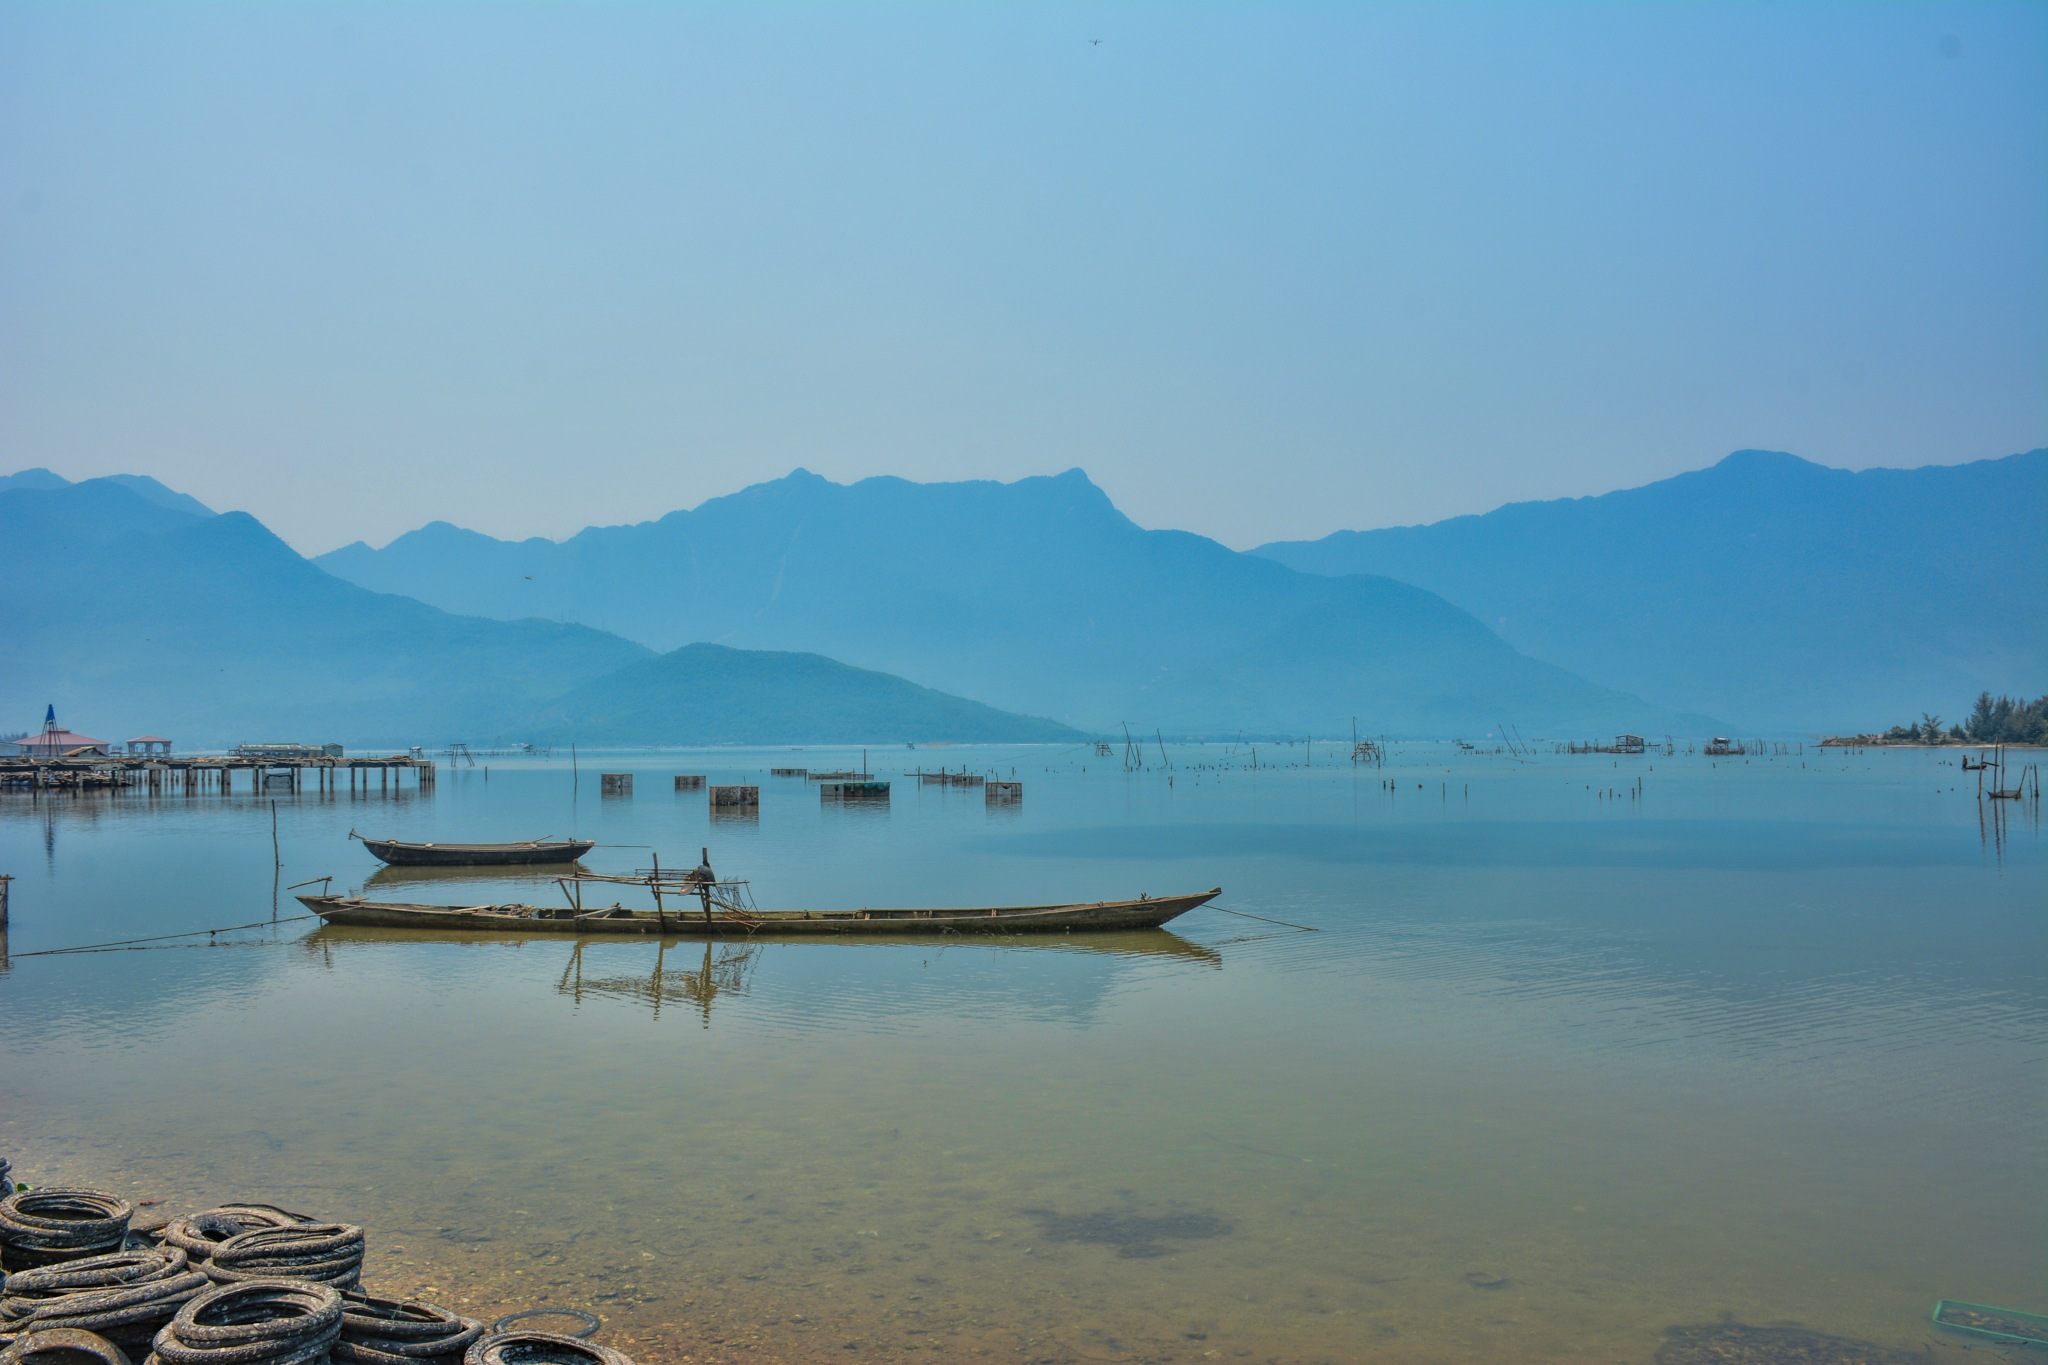 Fishing Village by Garry Evans